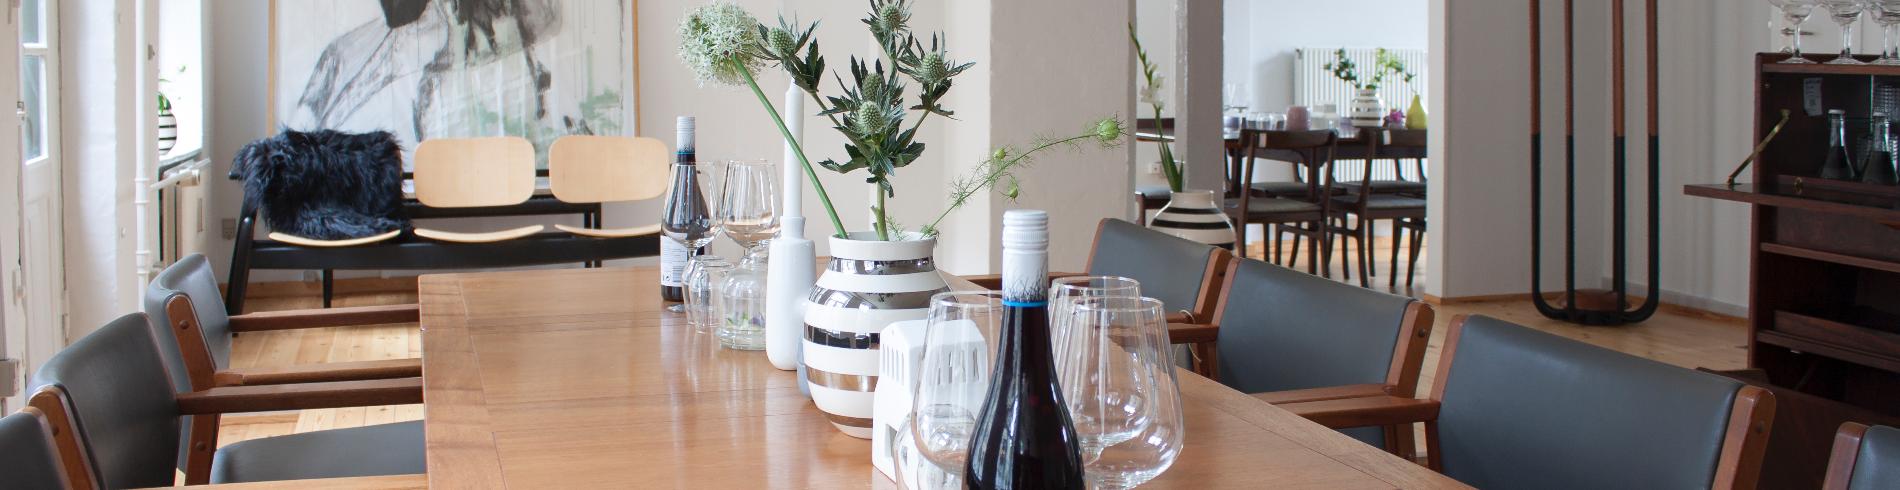 Danish Design Restaurants cover image